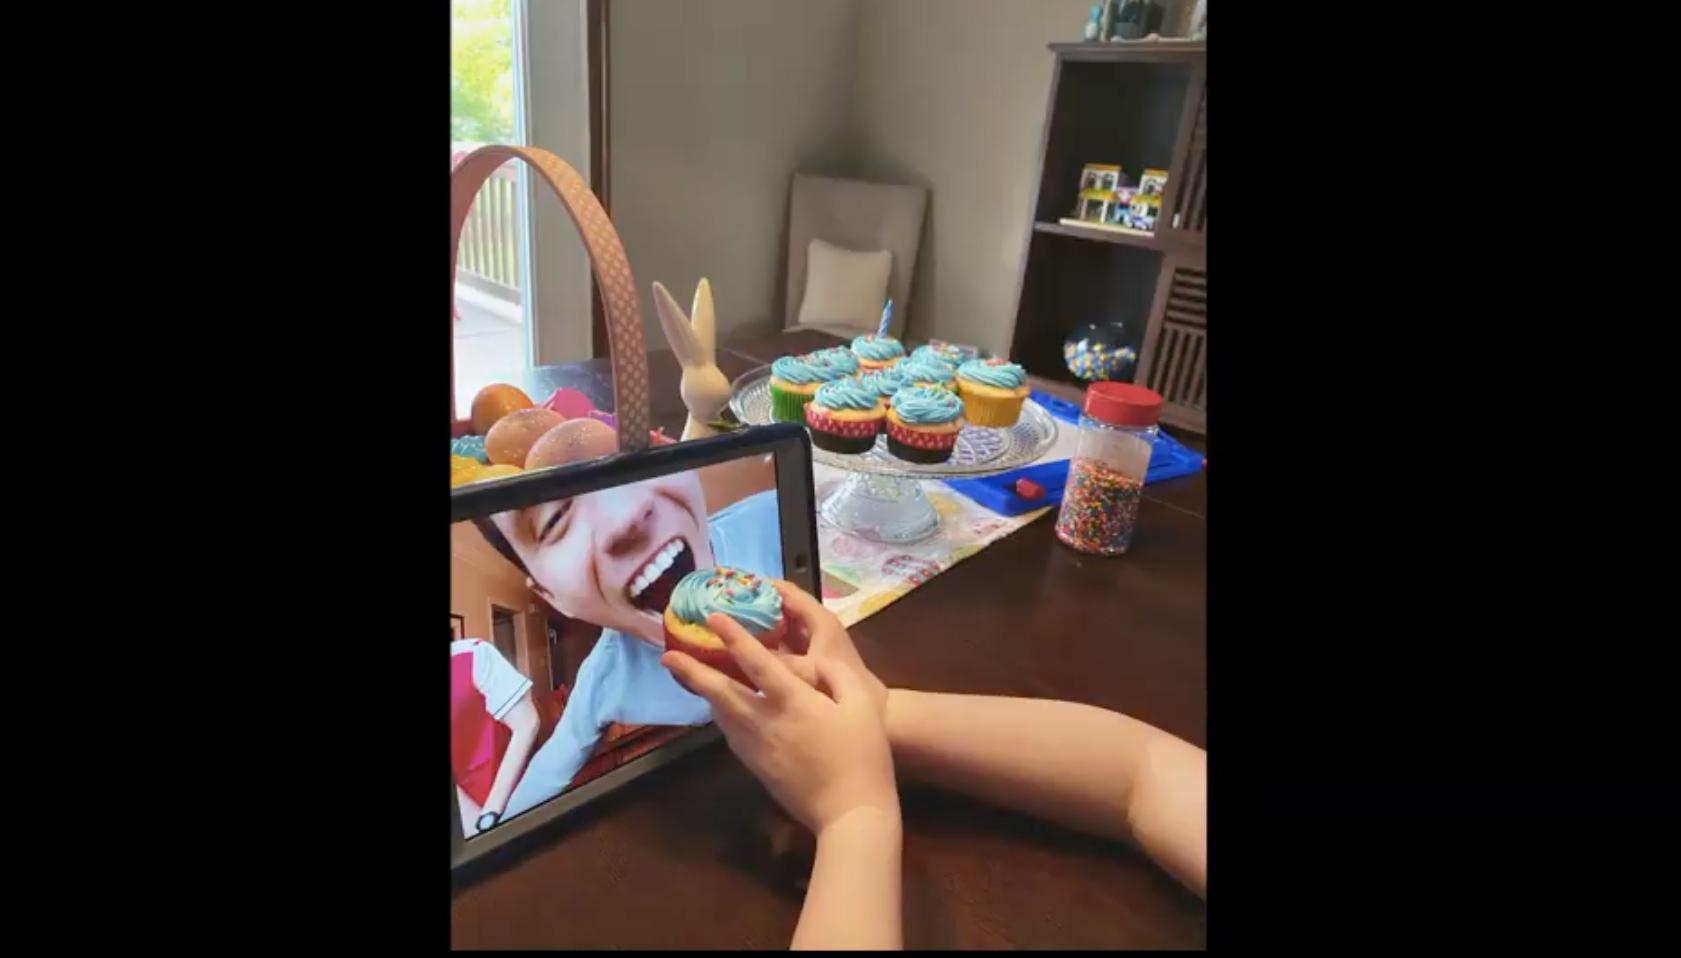 Apple Shares New 'Creativity Goes On' Video - MacRumors